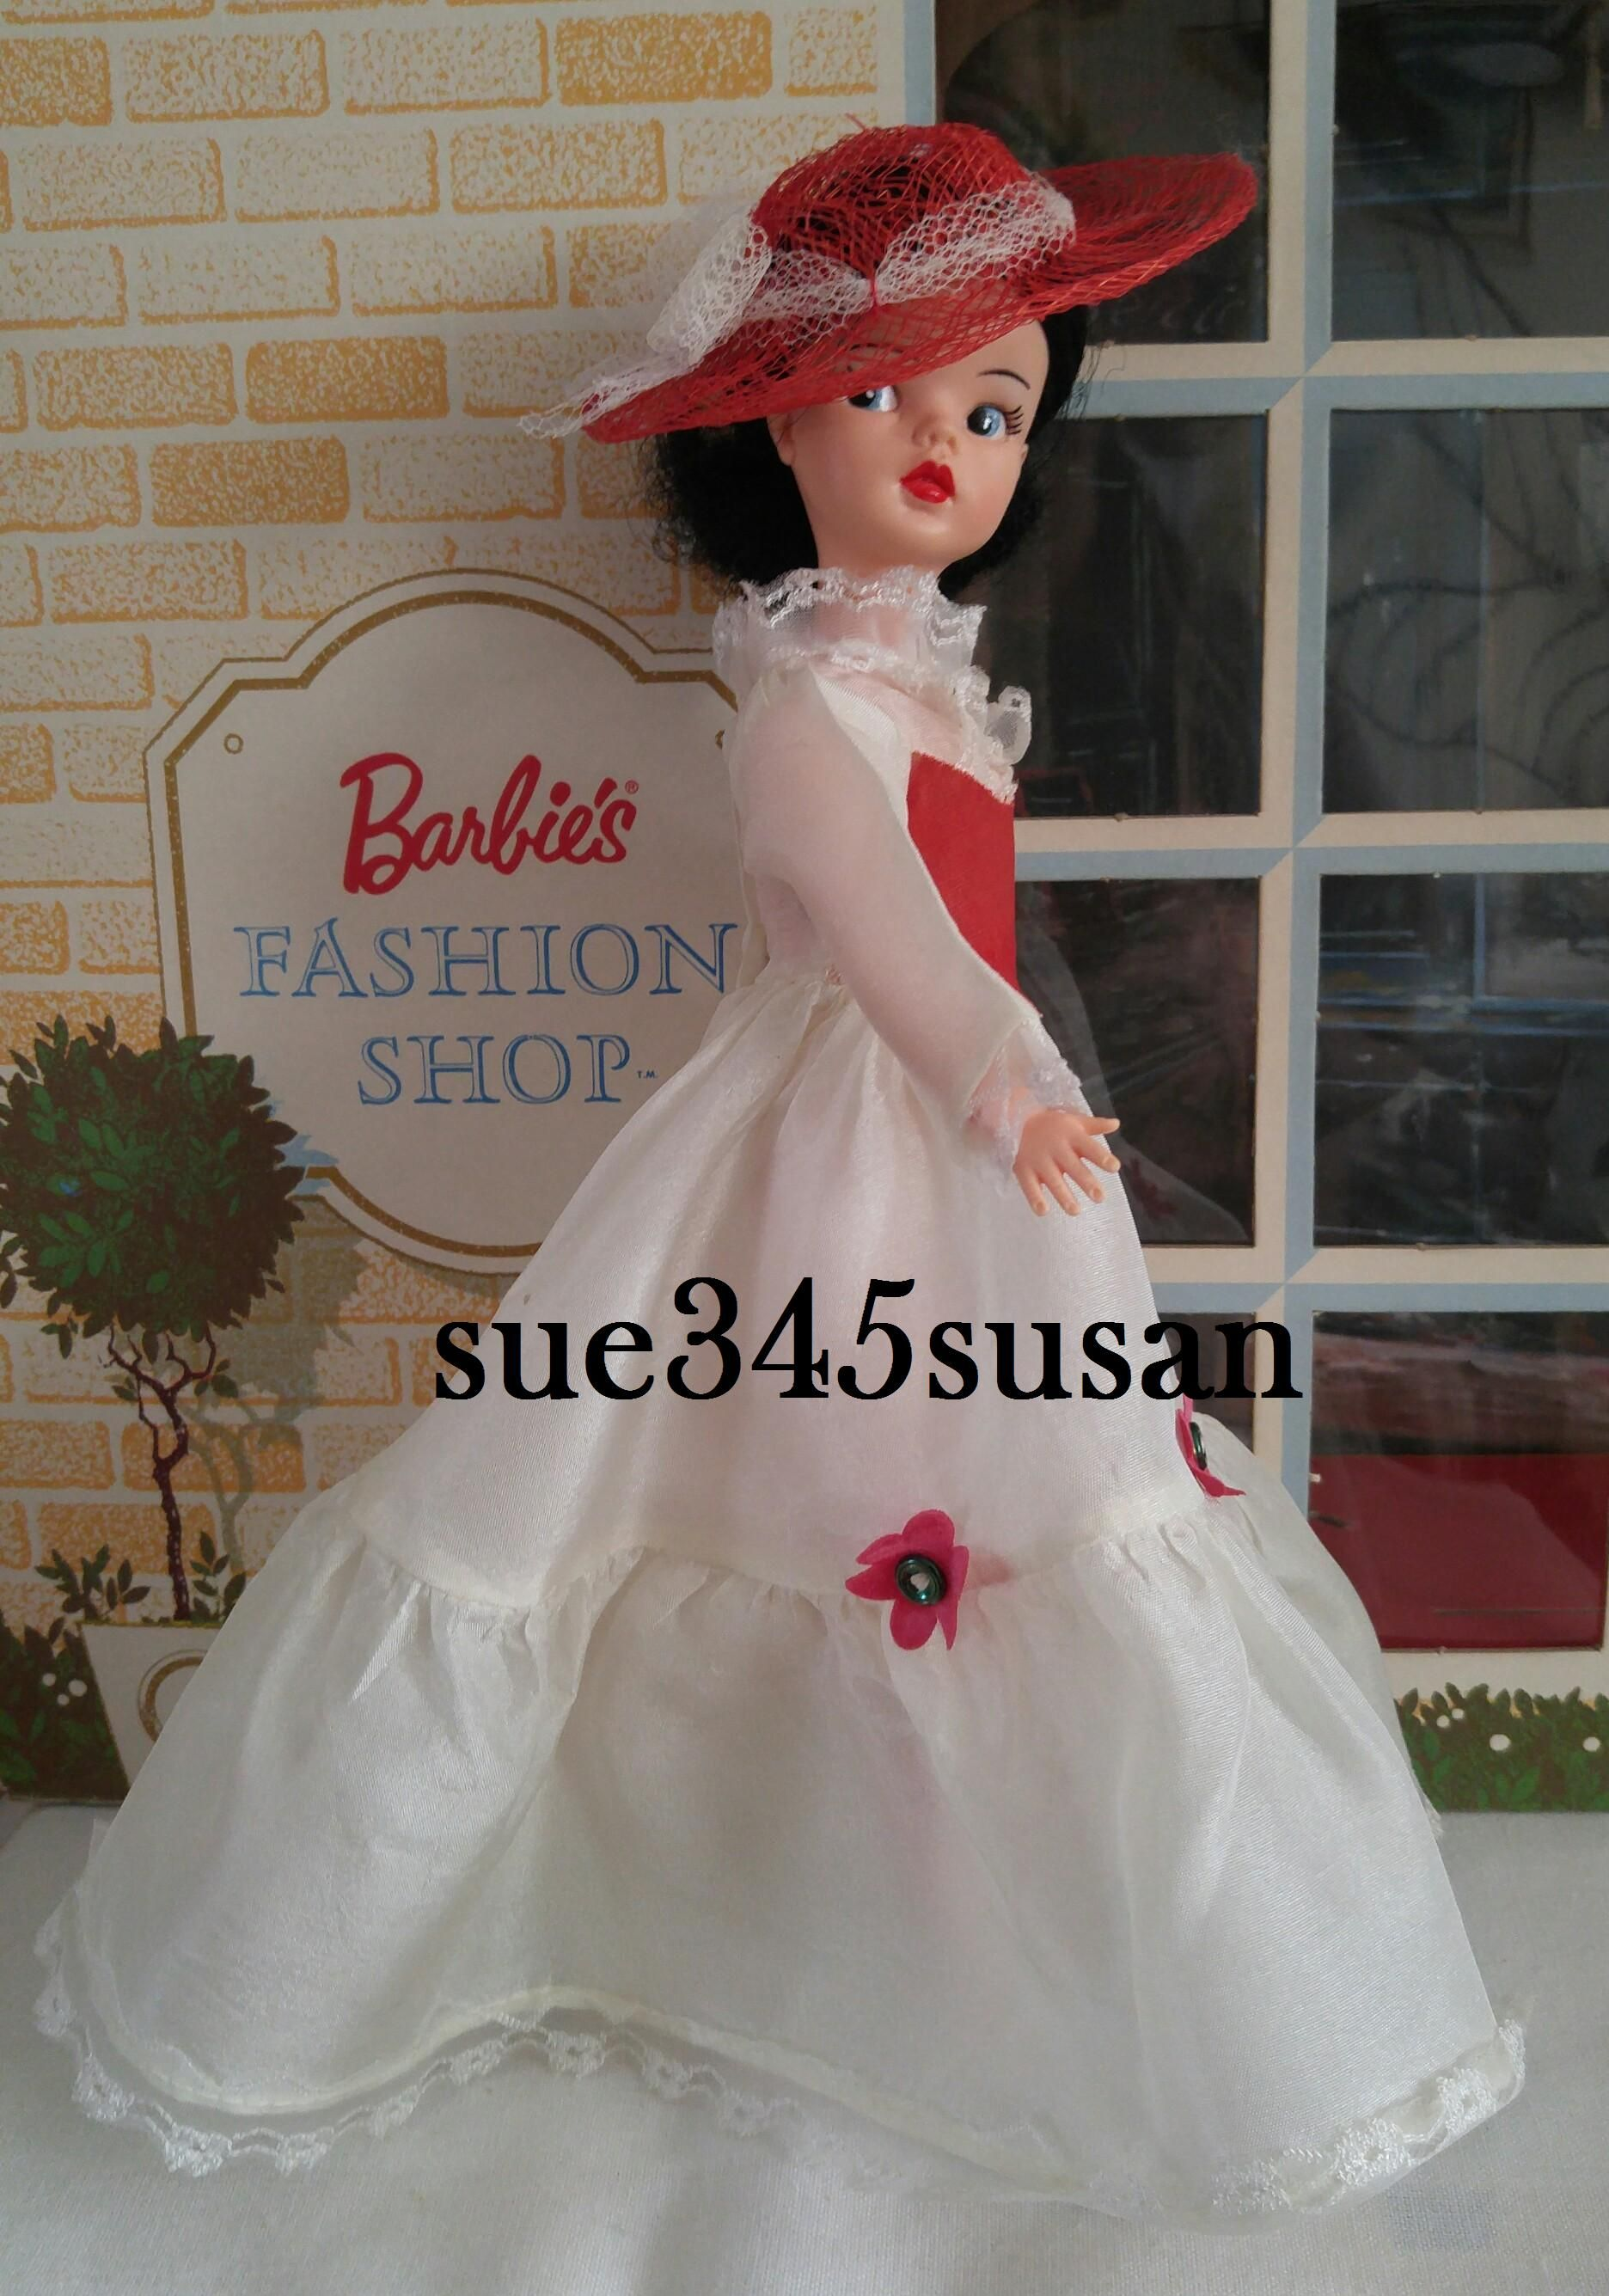 Vintage Tammy Canadian Reliable Tammy Poppins Barbie